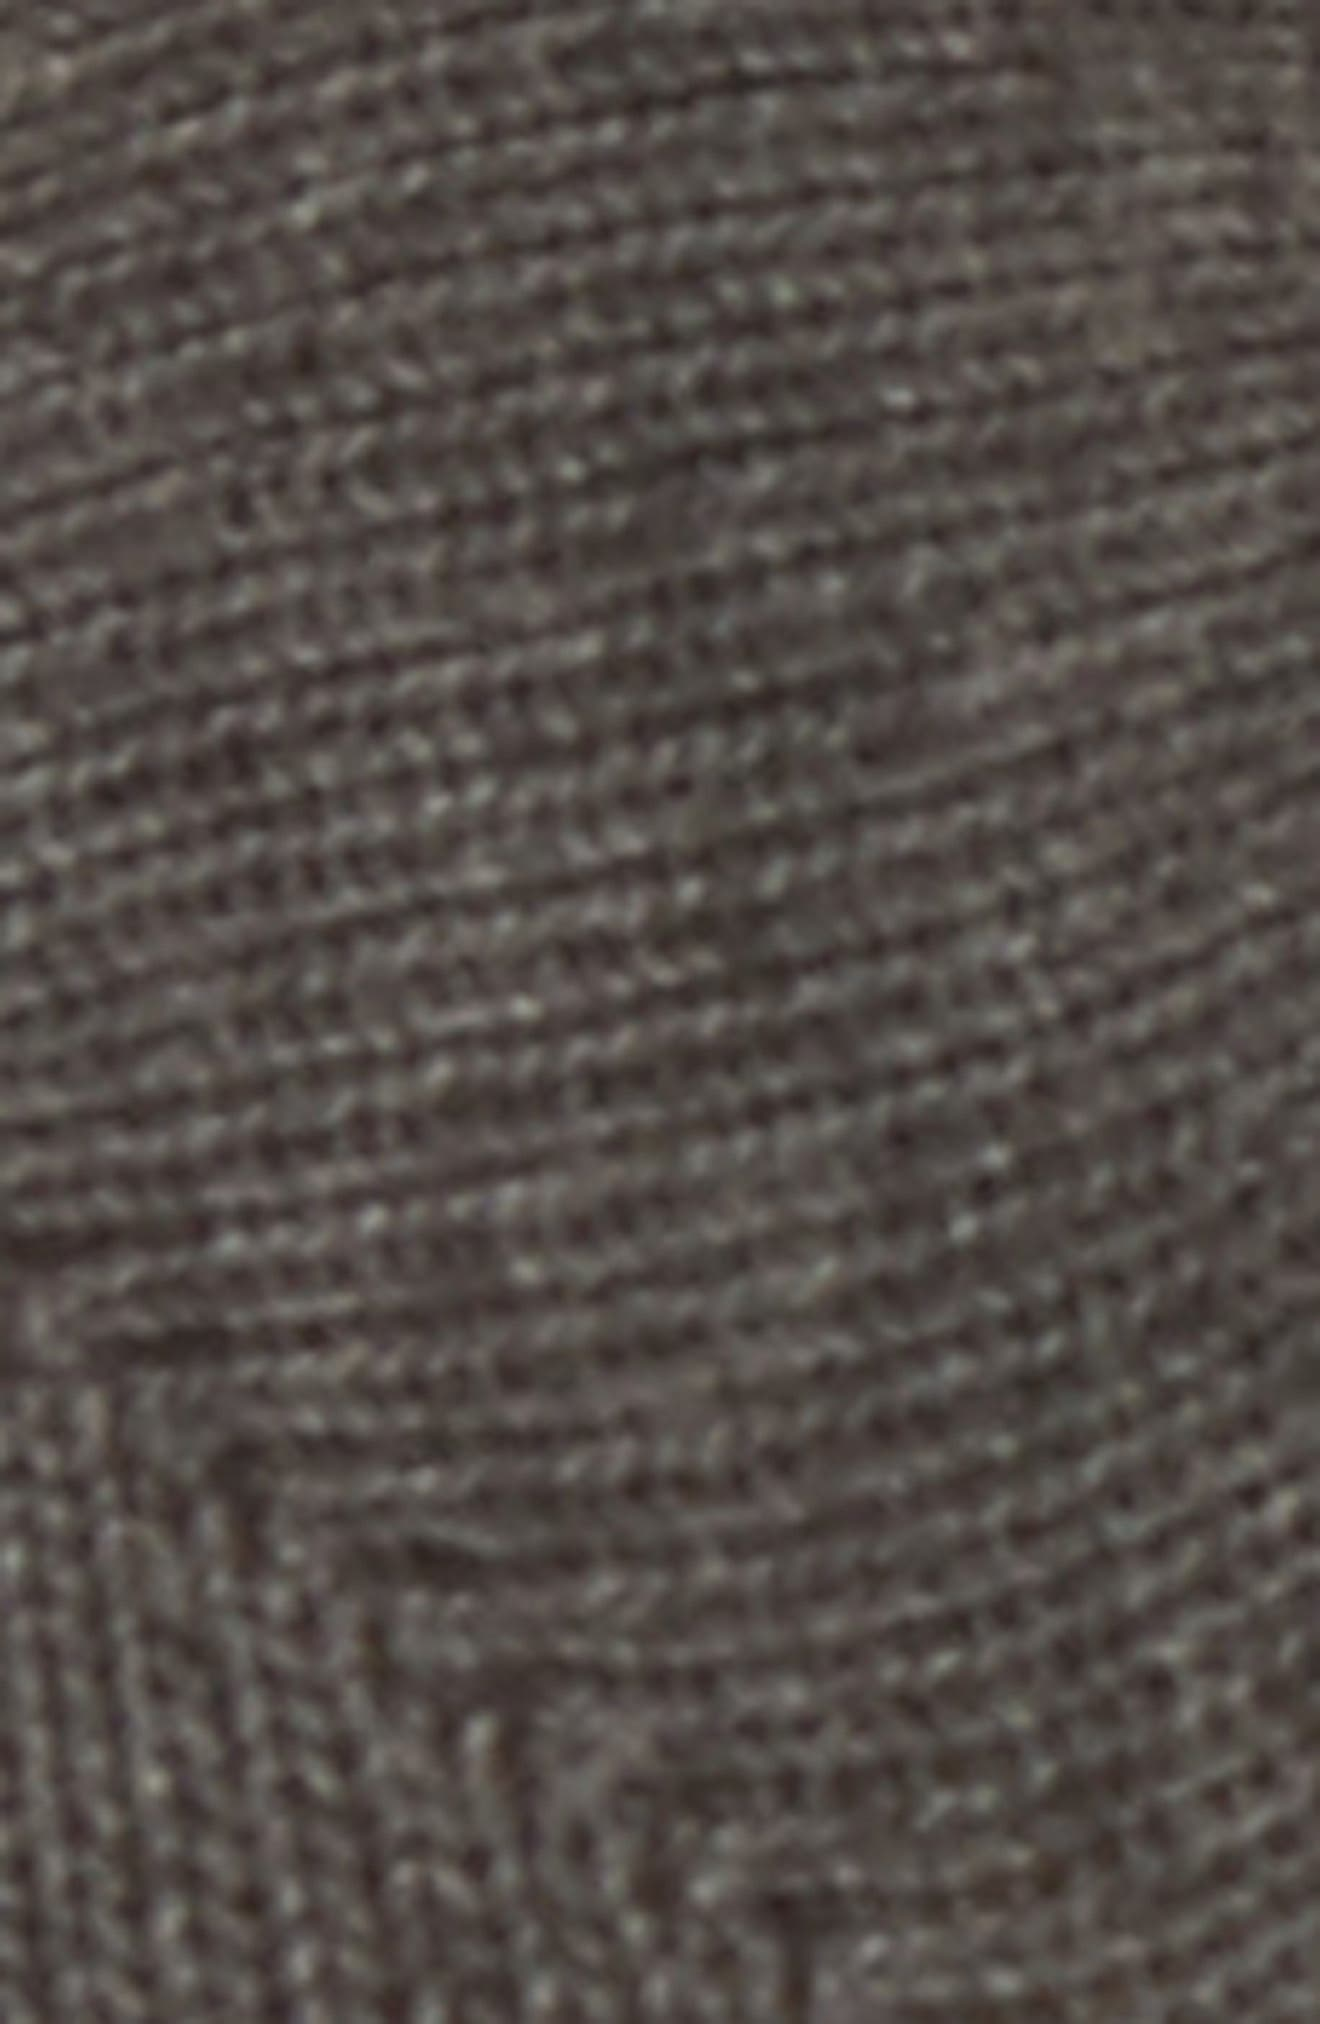 Elle Half Toe Gripper Socks,                             Alternate thumbnail 2, color,                             Charcoal